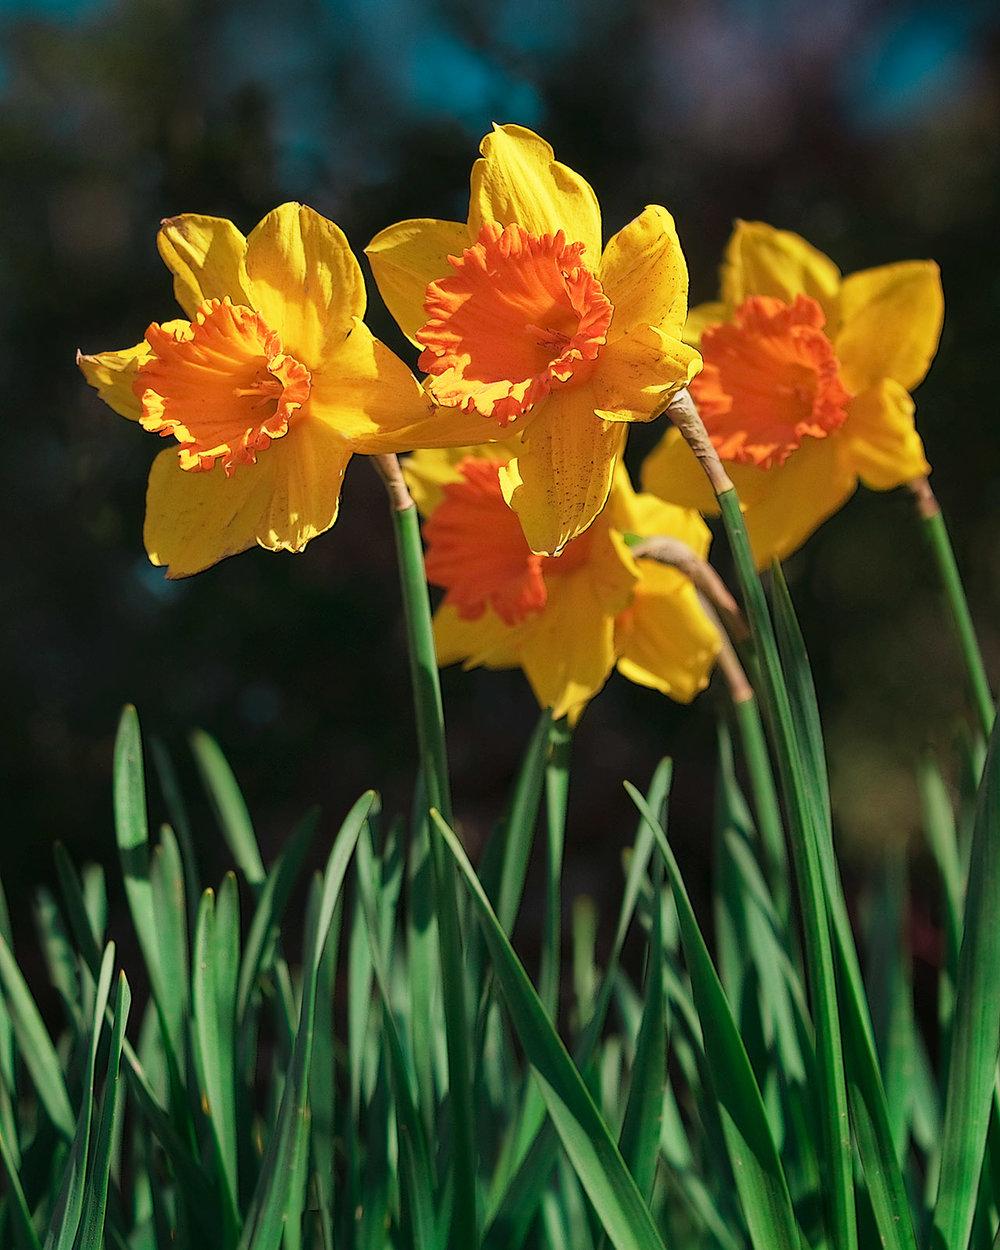 02-2019 Daffodil #3.jpg